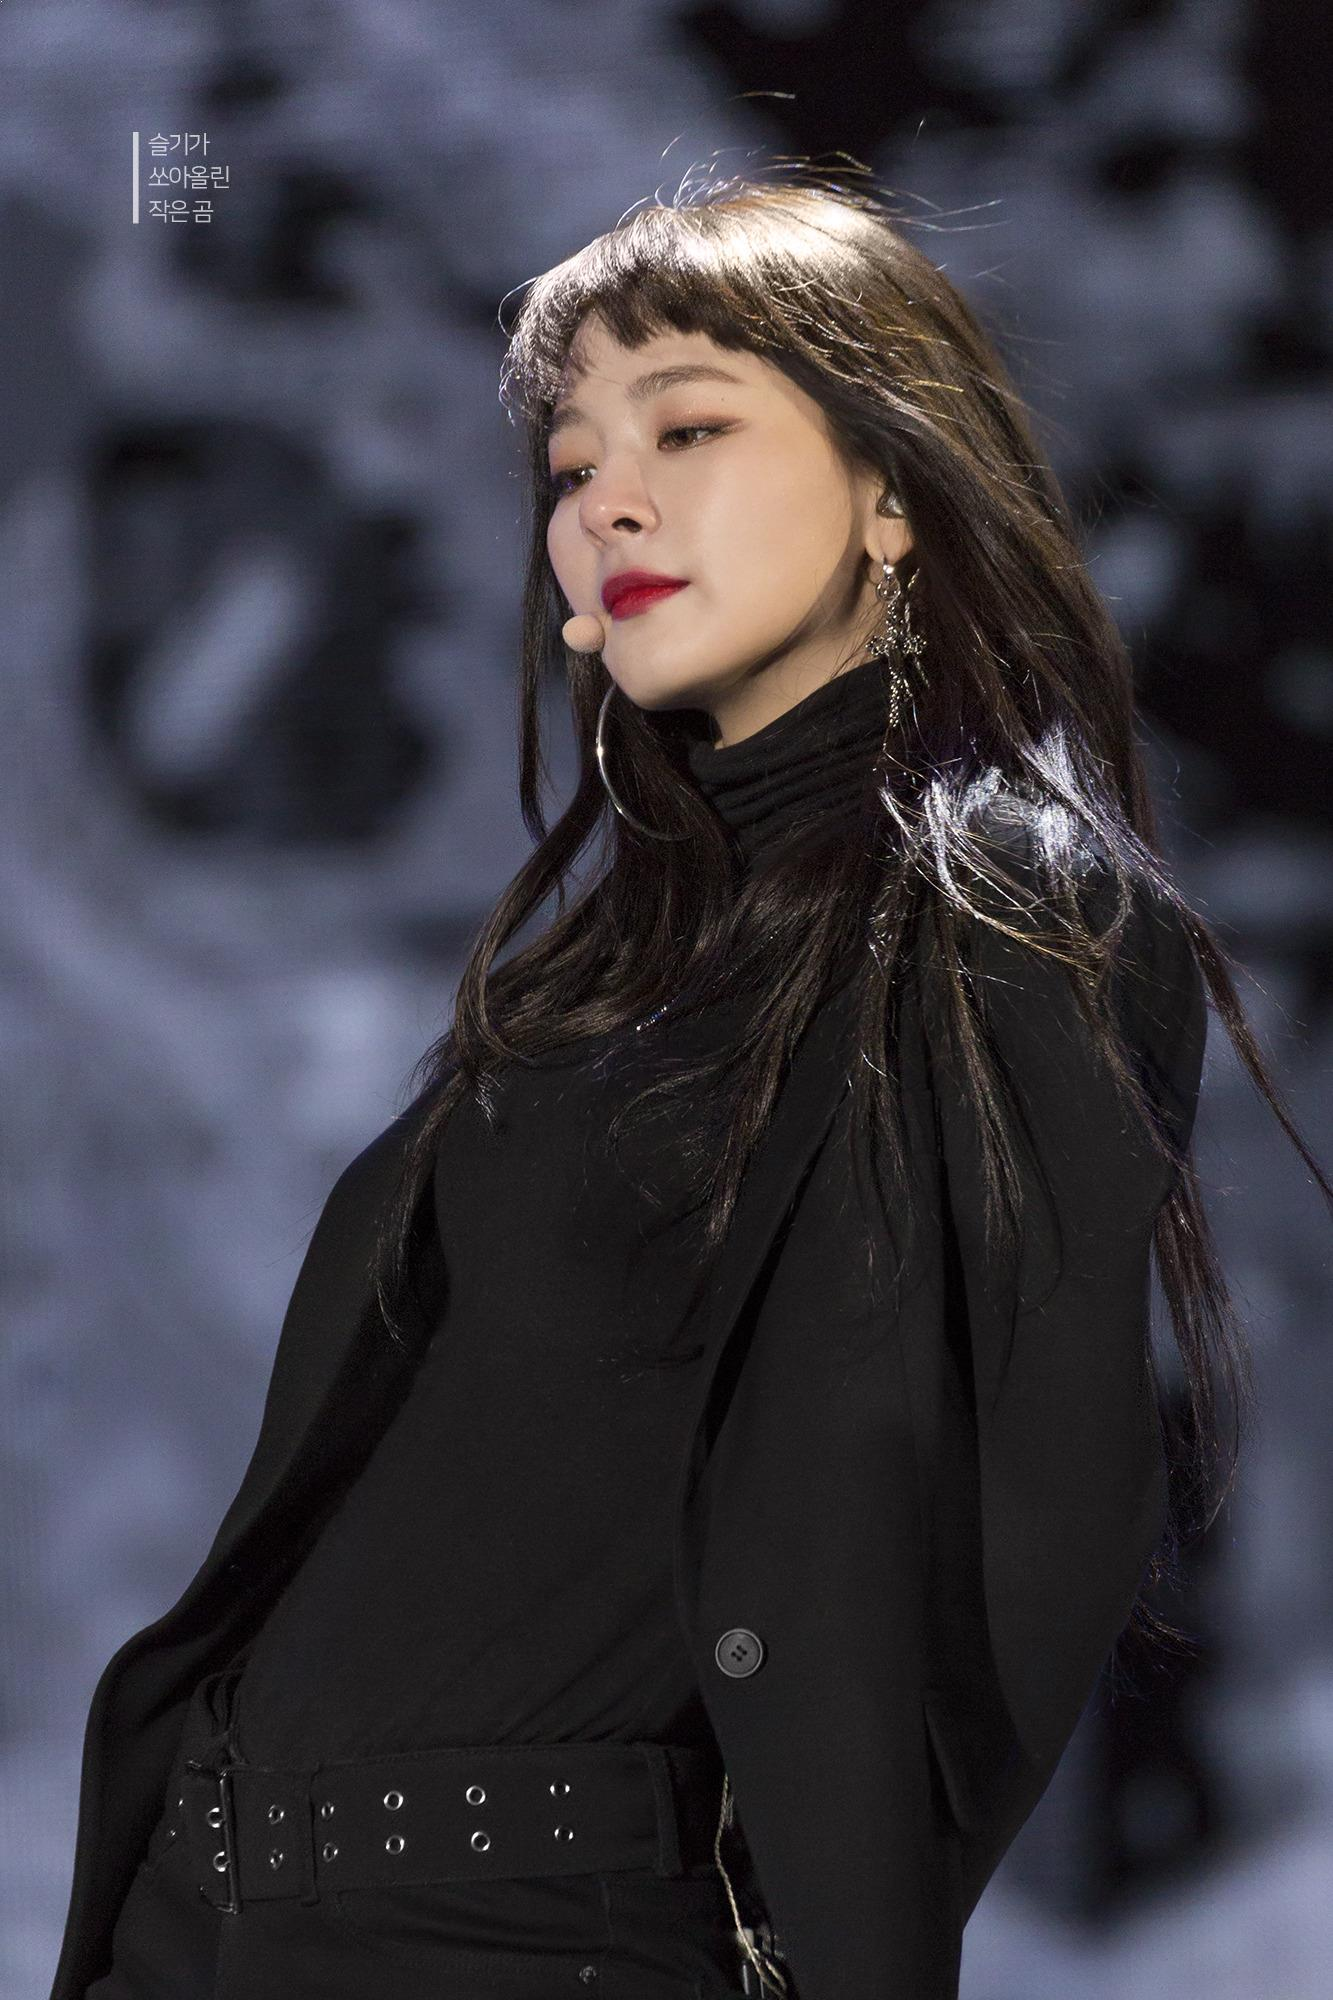 SeulGi, SeulGi Profile, SeulGi All Black, Red Velvet SeulGi